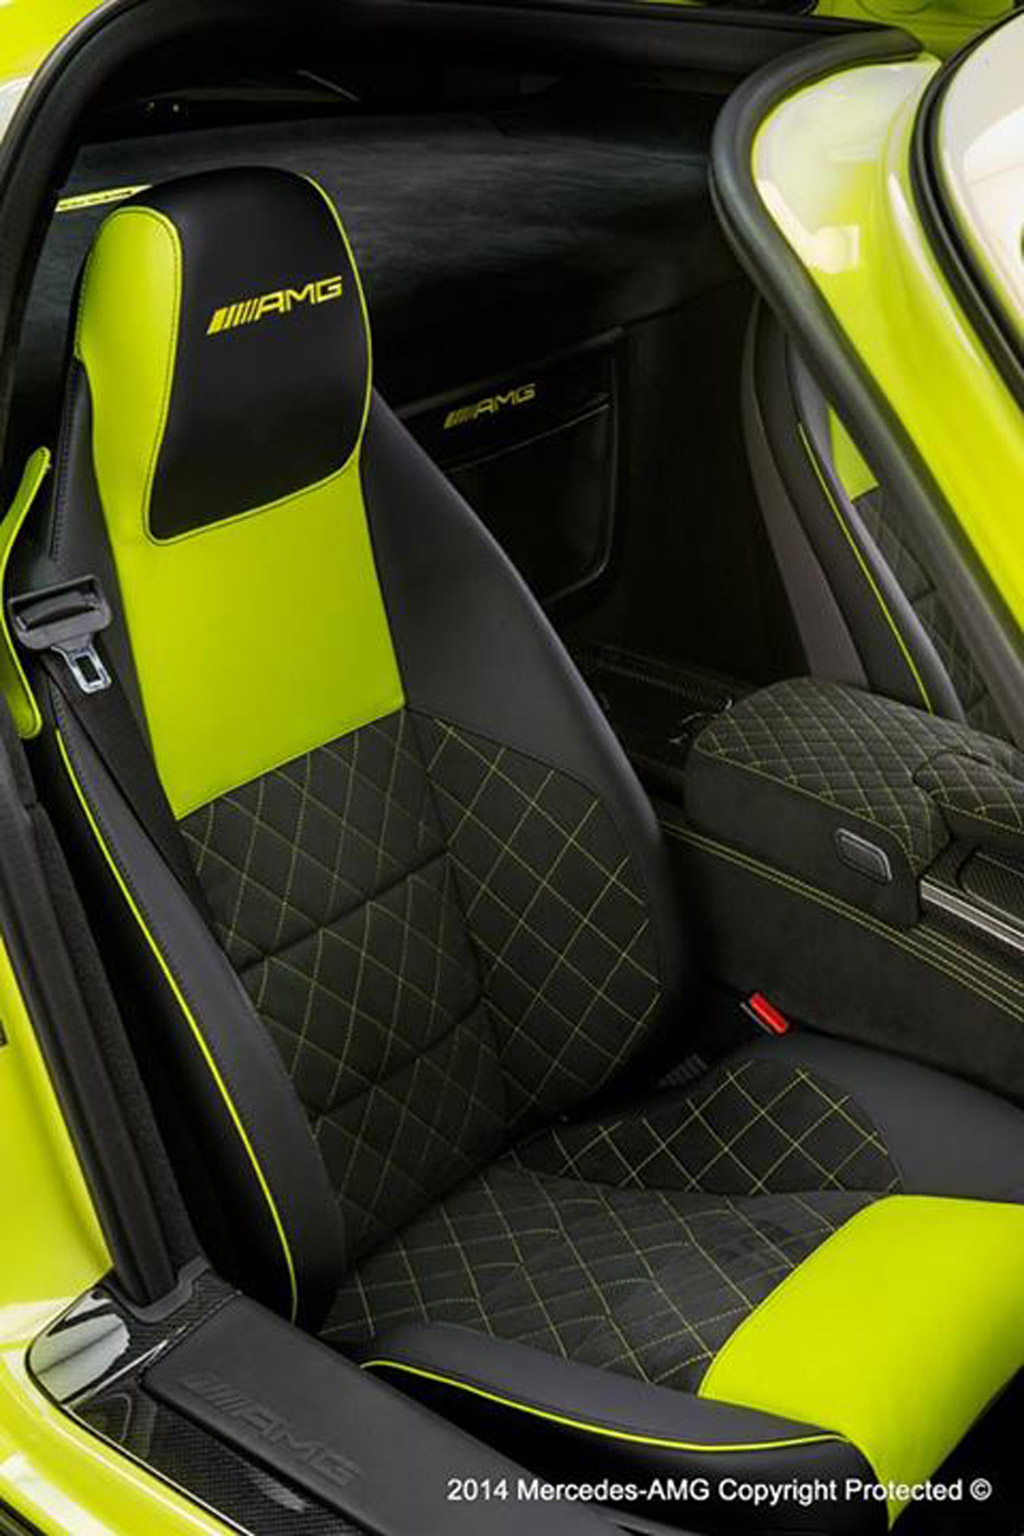 2014 Mercedes-Benz SLS AMG Black Series enhanced by the AMG Performance Studio